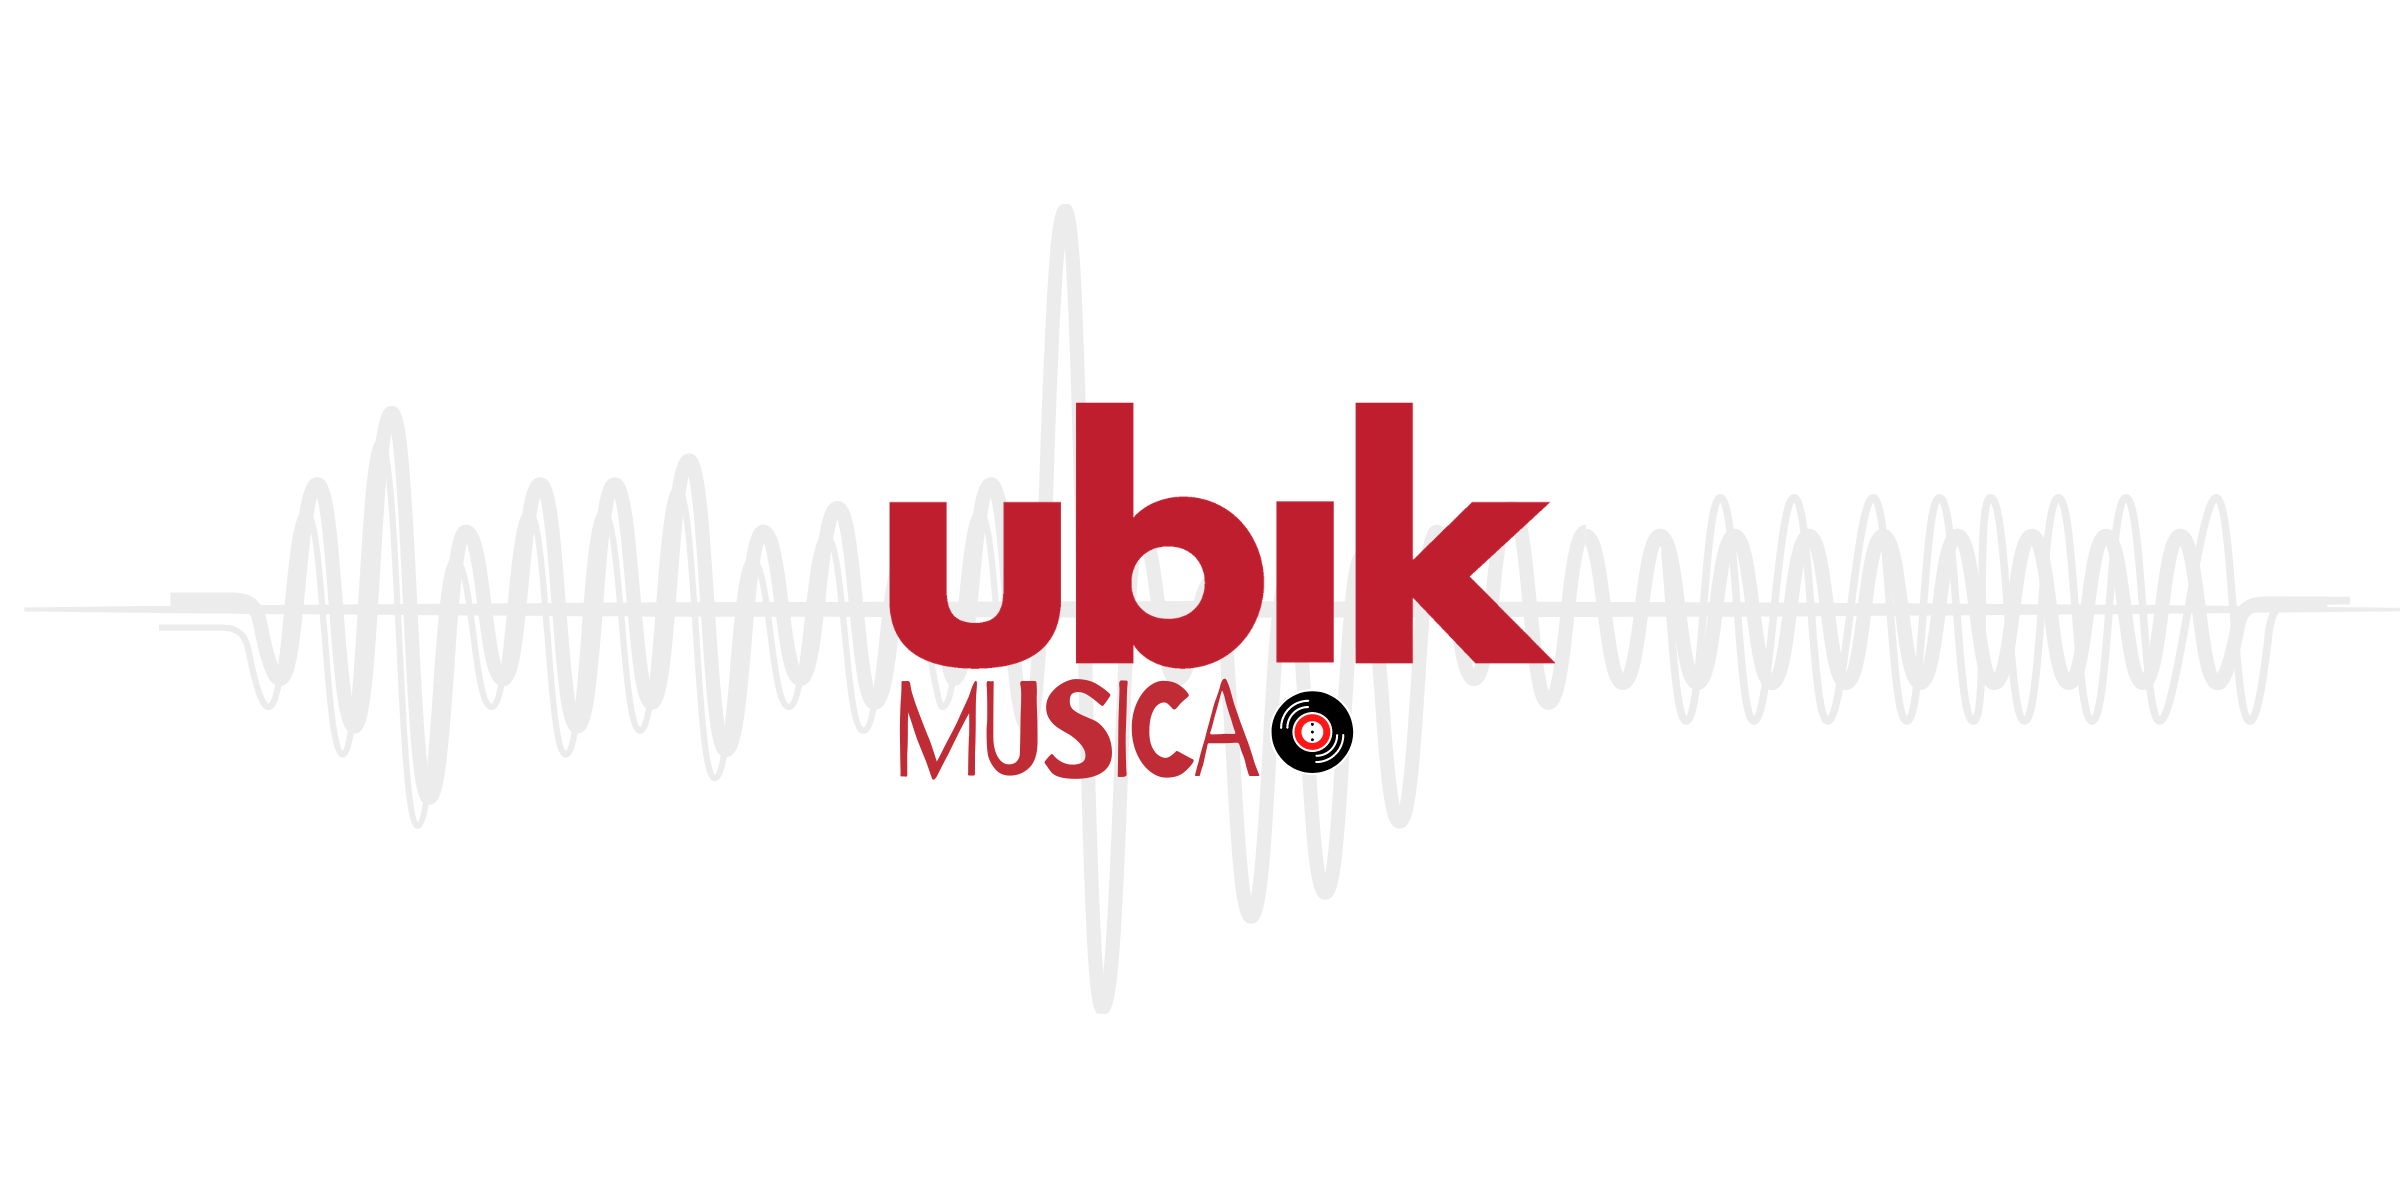 Ubik Musica